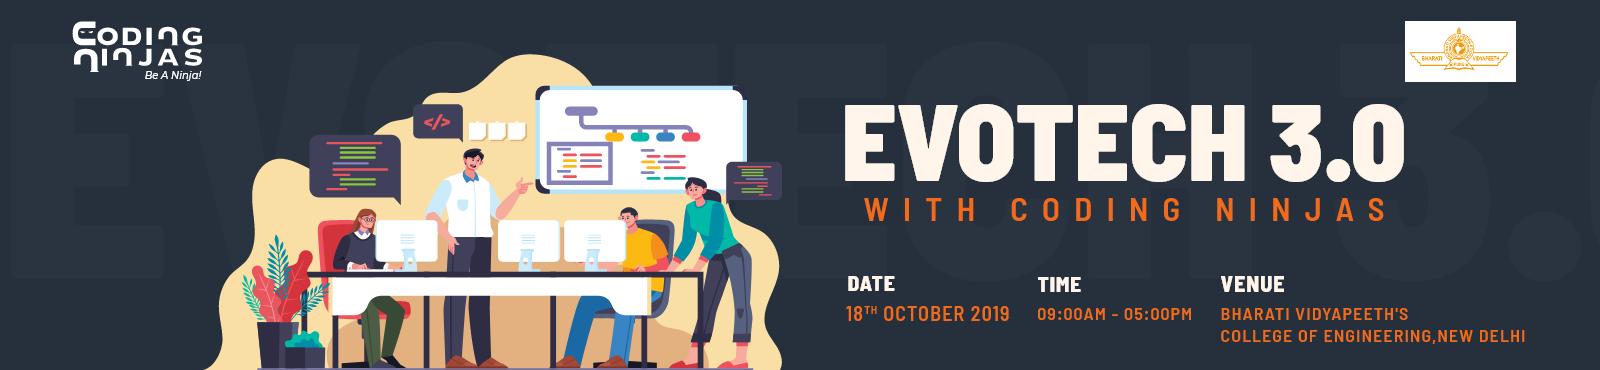 Evotech 3.0